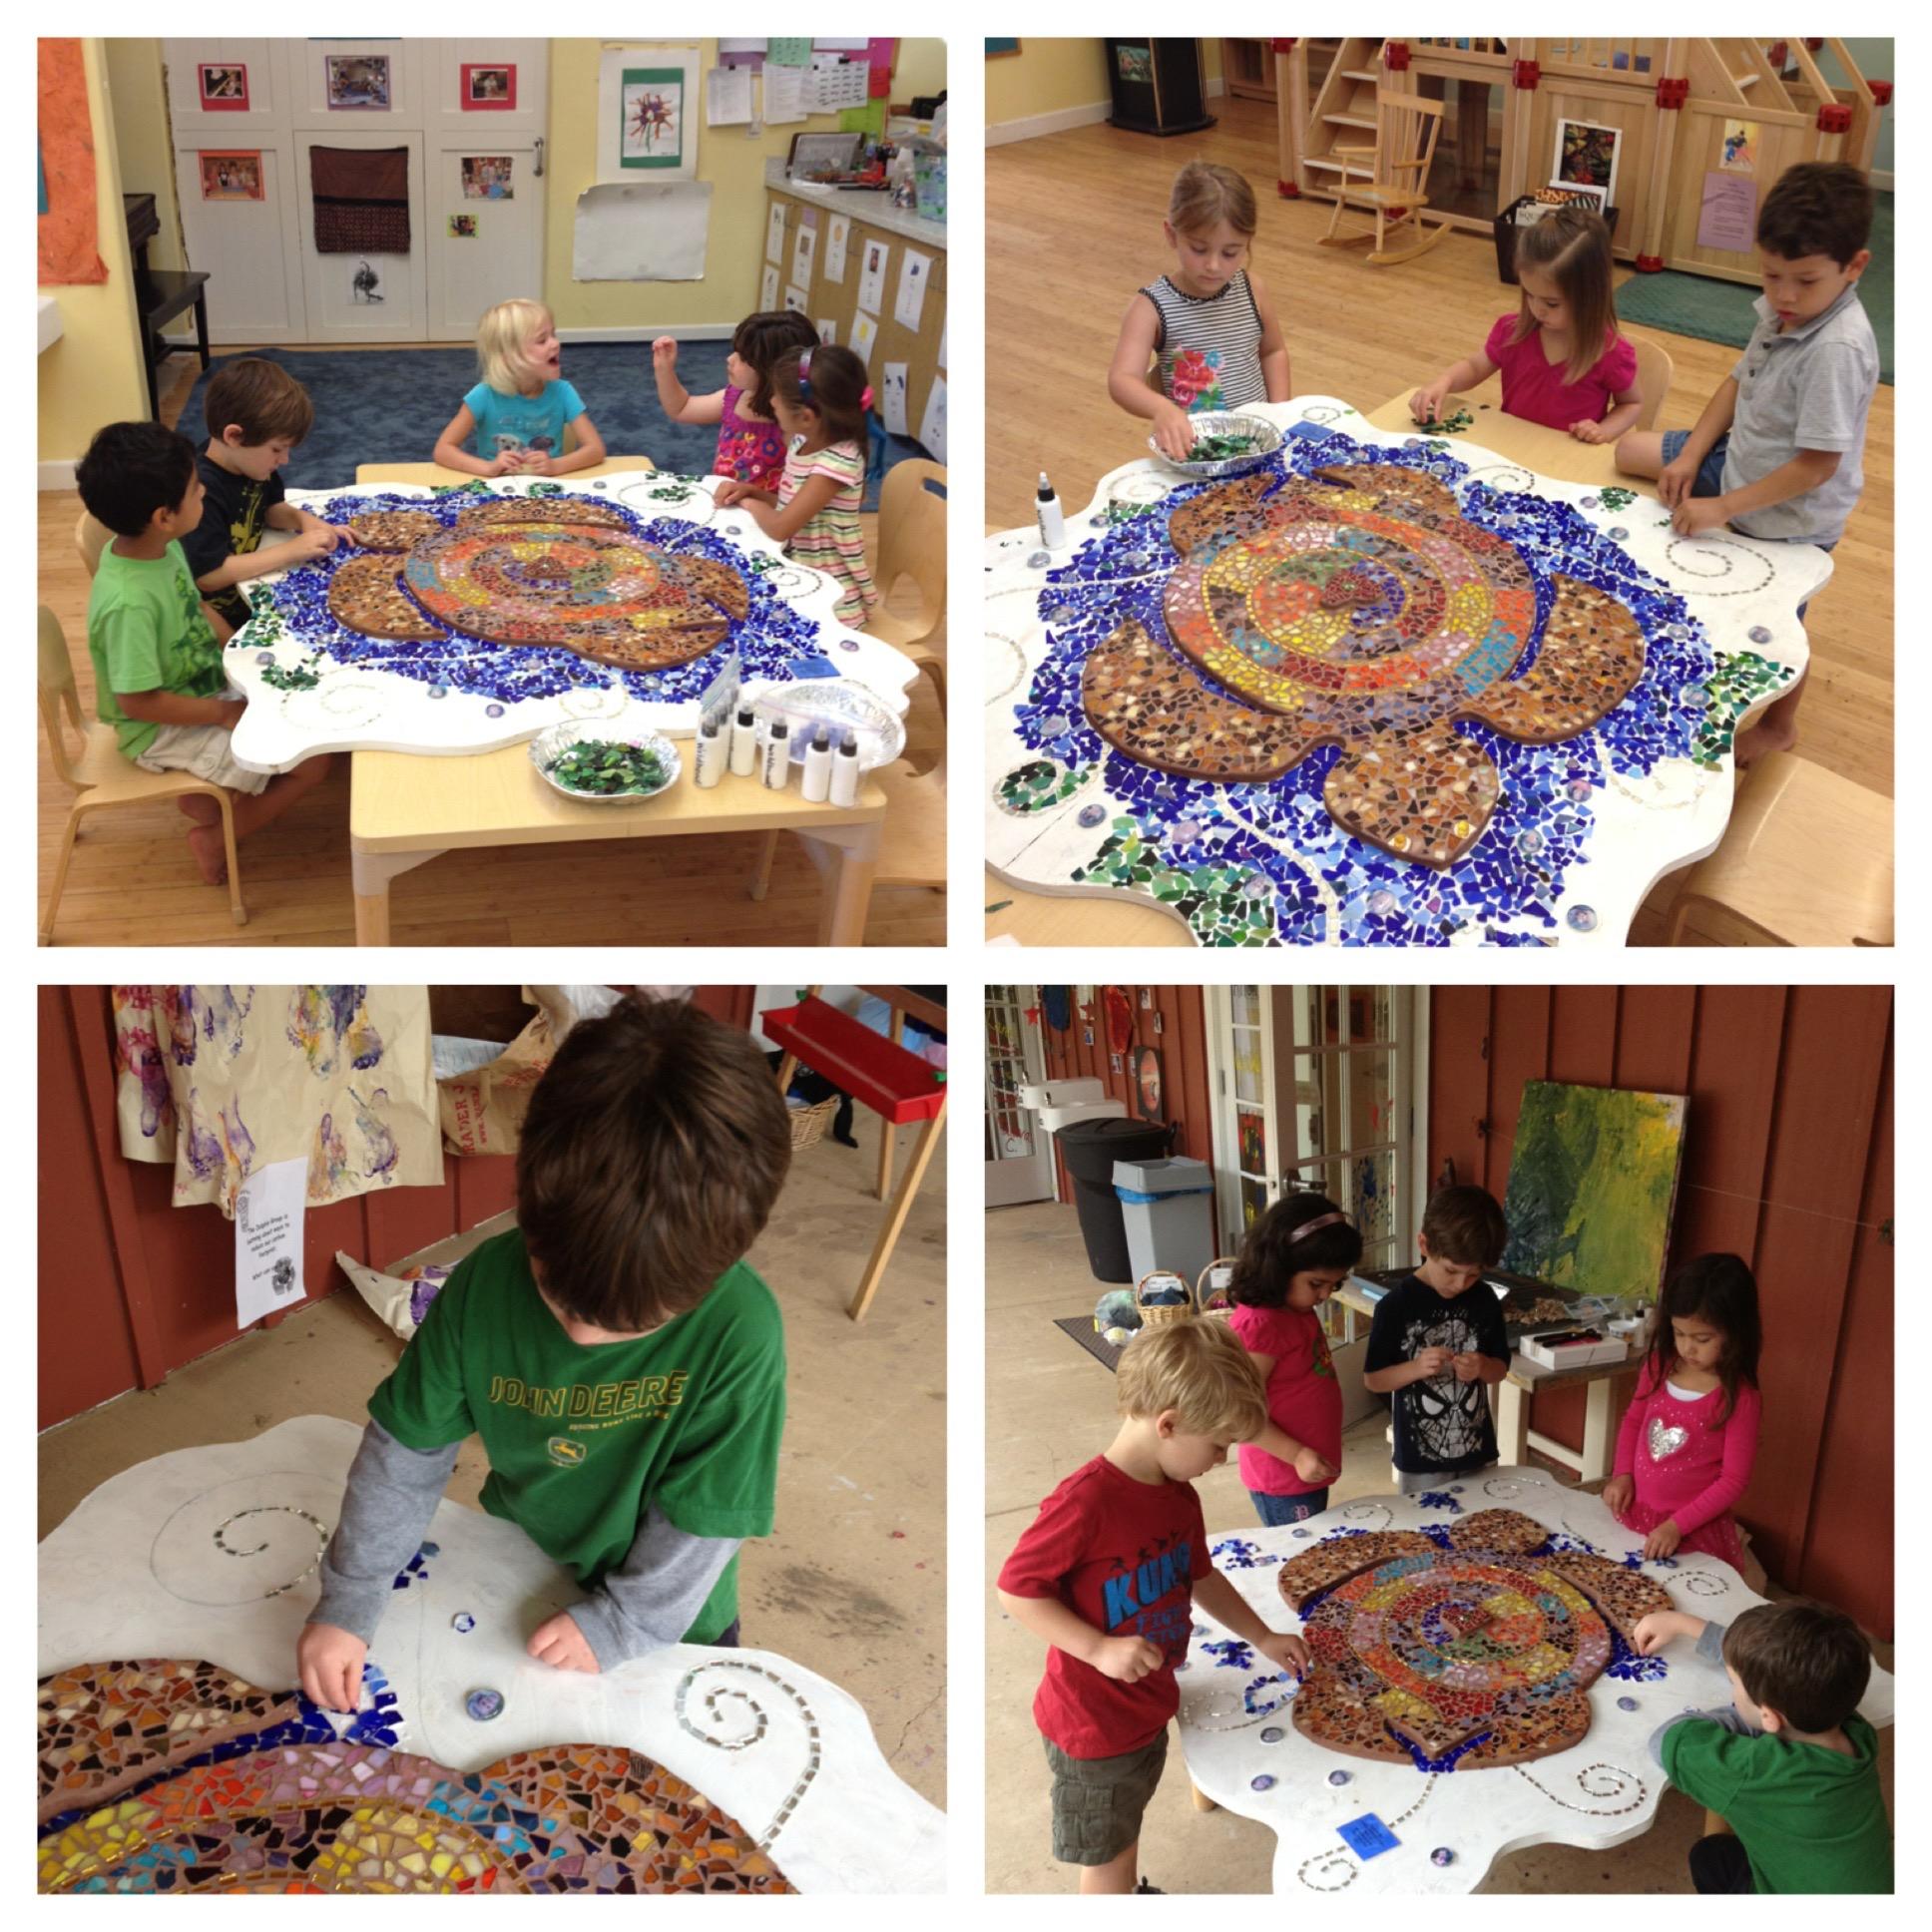 Orfalea Children's Center